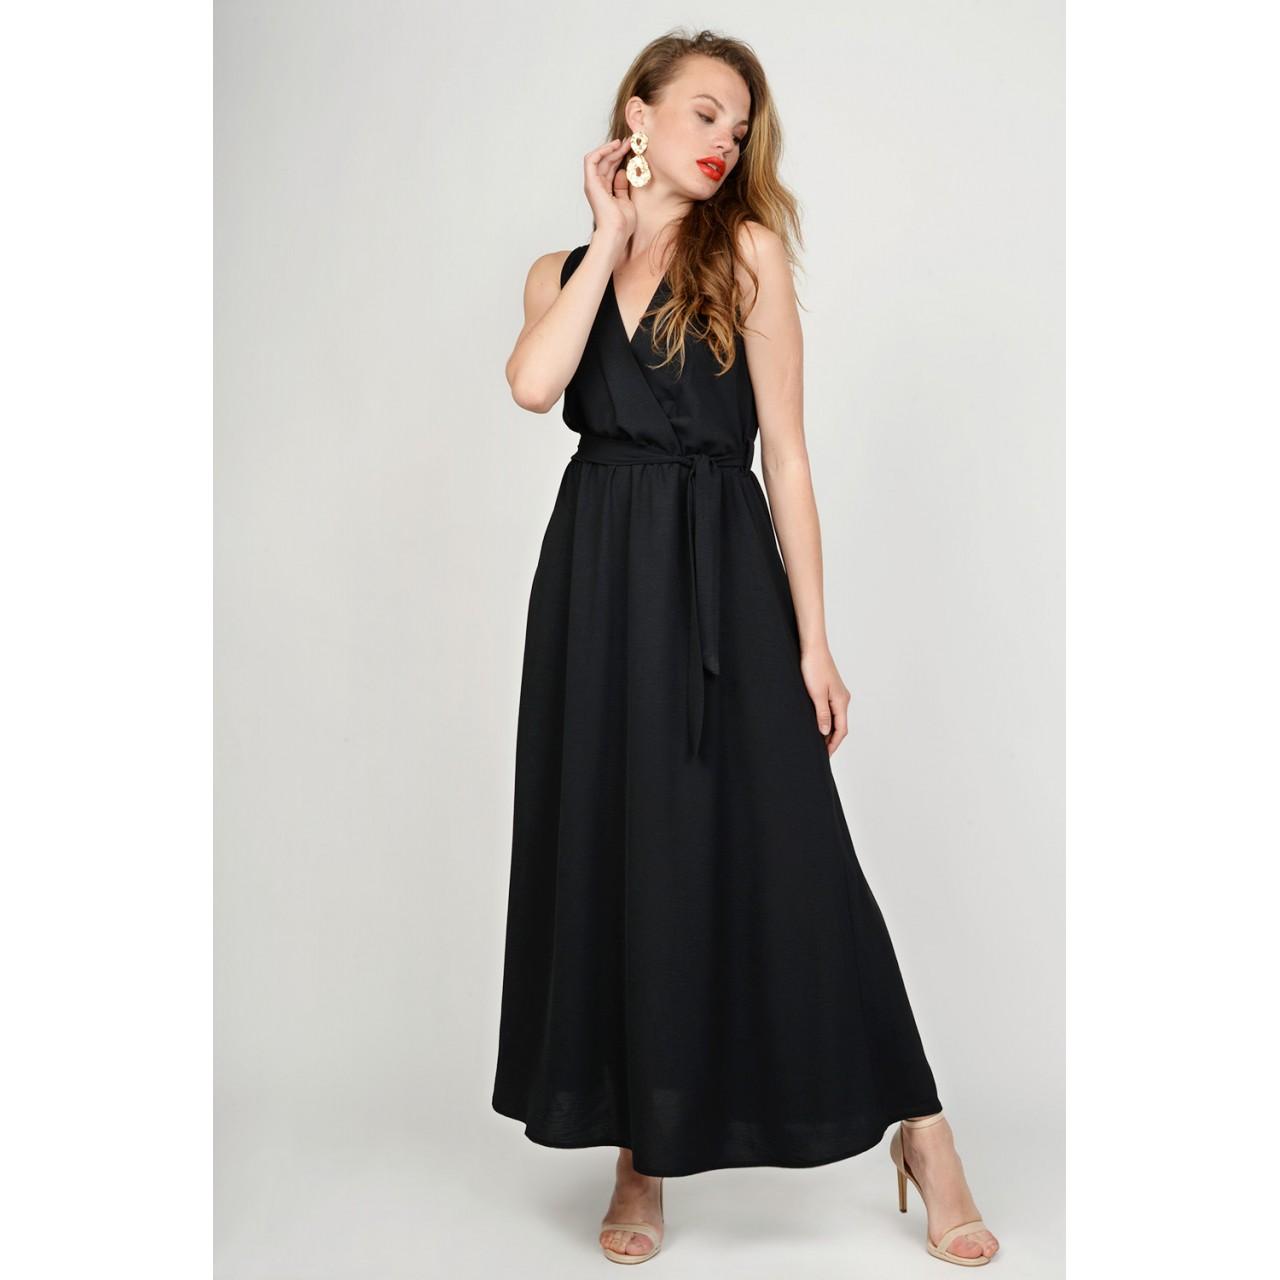 ebfaa3ddf76 Φόρεμα μακρύ αμάνικο με ζώνη